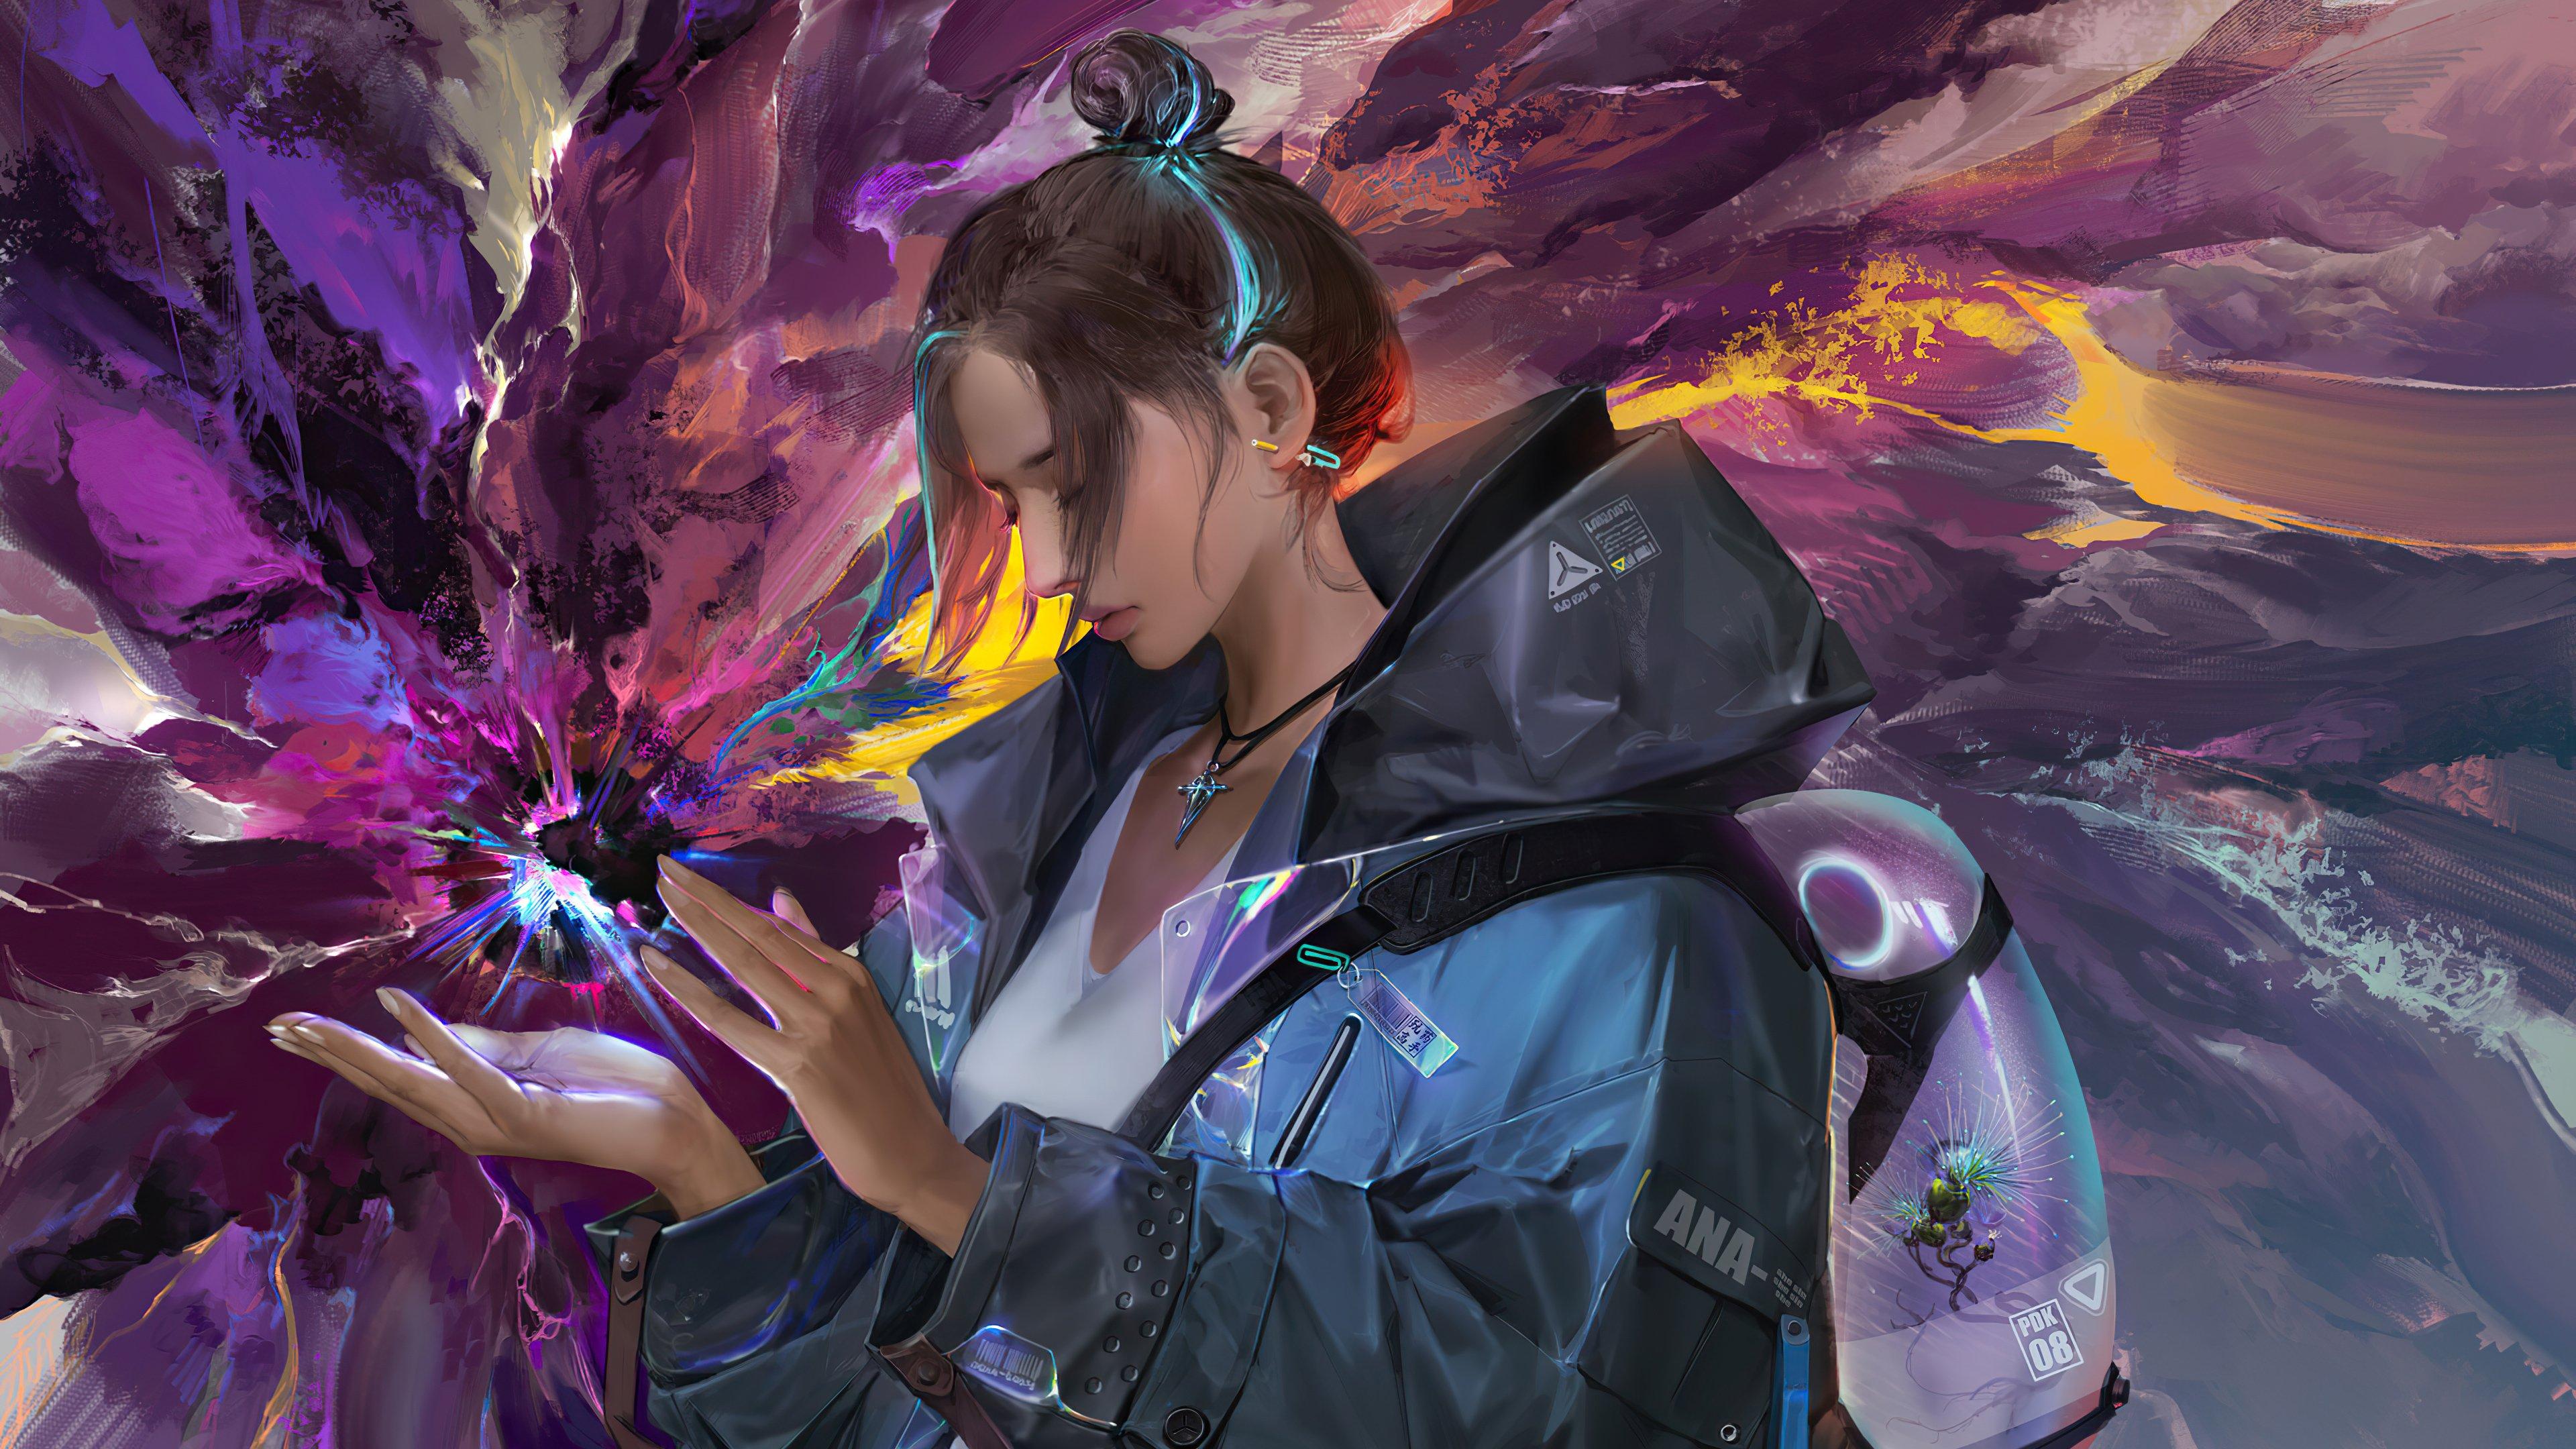 Fondos de pantalla Chica con fondo en fusión de colores